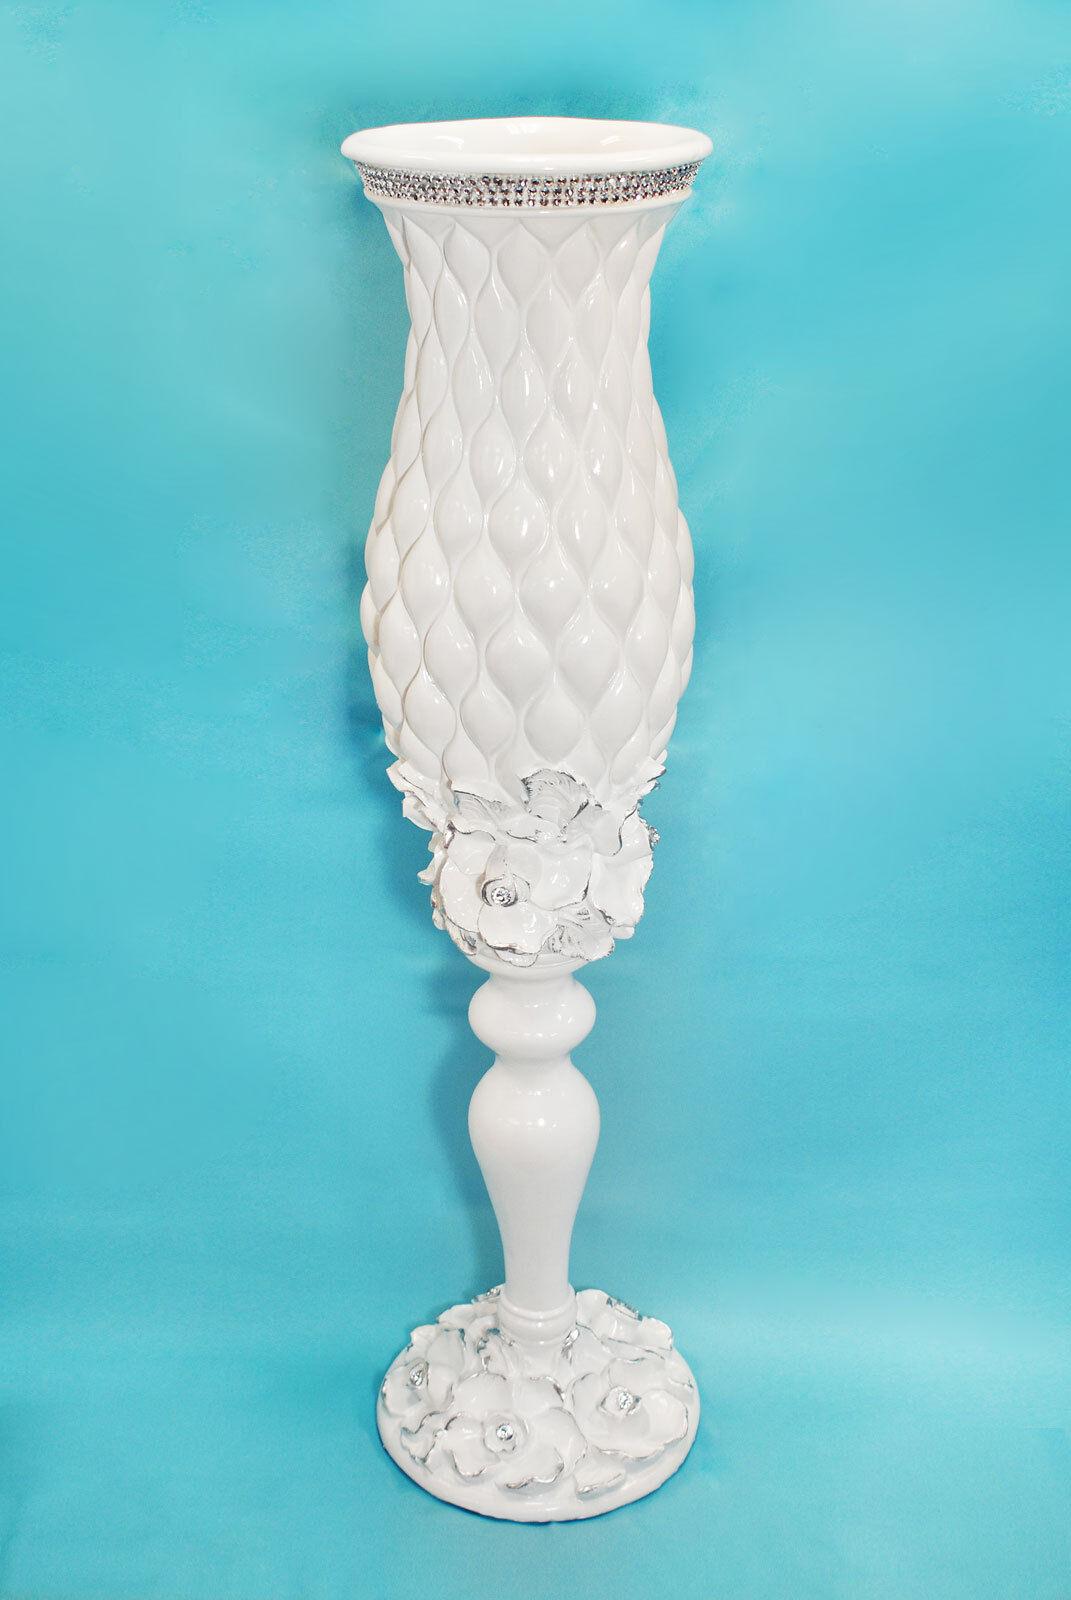 Vase Fiberglass Garden Home Decor Acrylic Diamond Decoration Vintage Flower